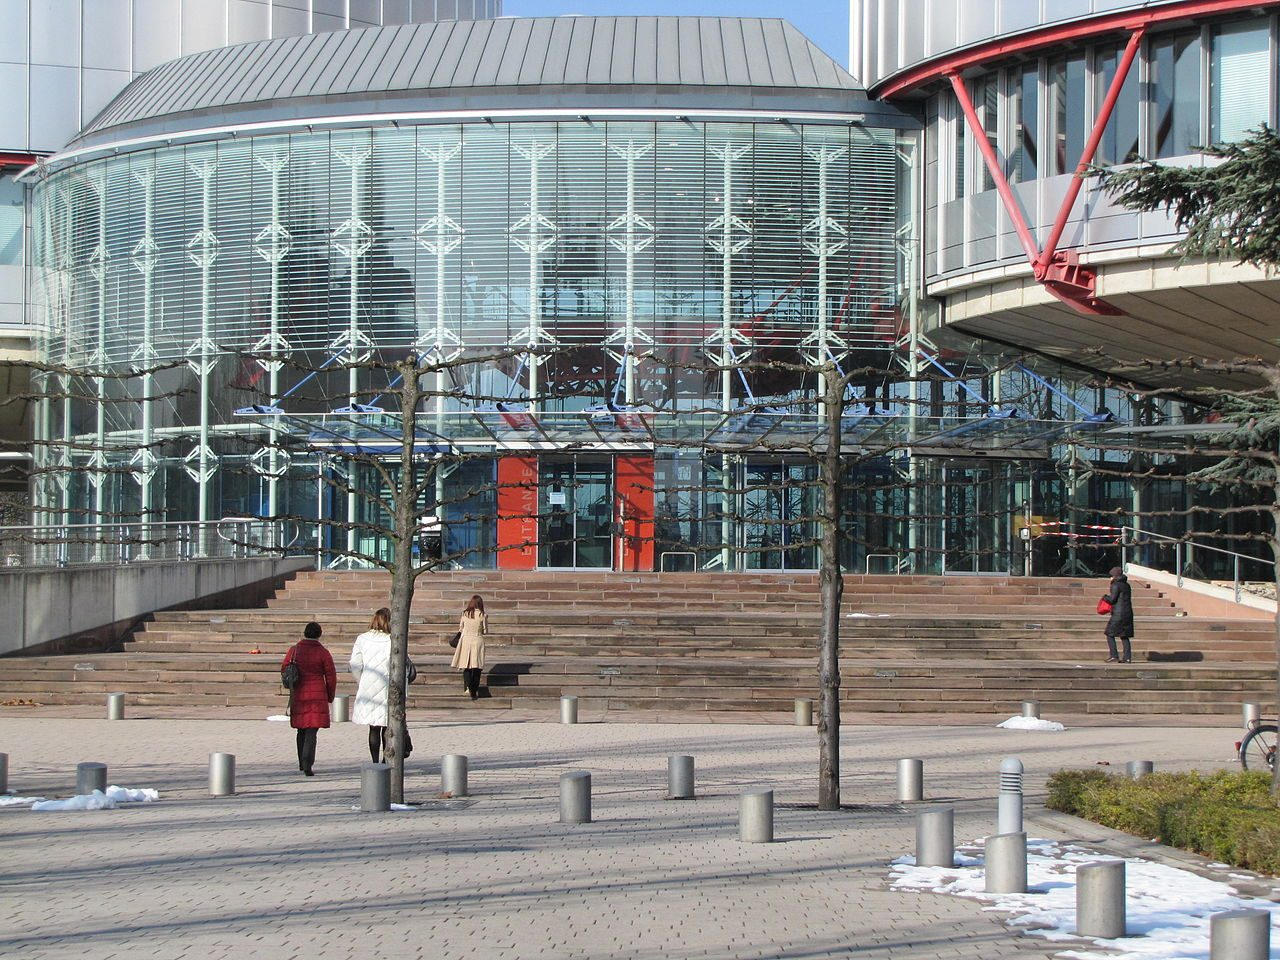 1280px-Strasbourg_EuropeDroitsHomme_n05-1280x960.jpg